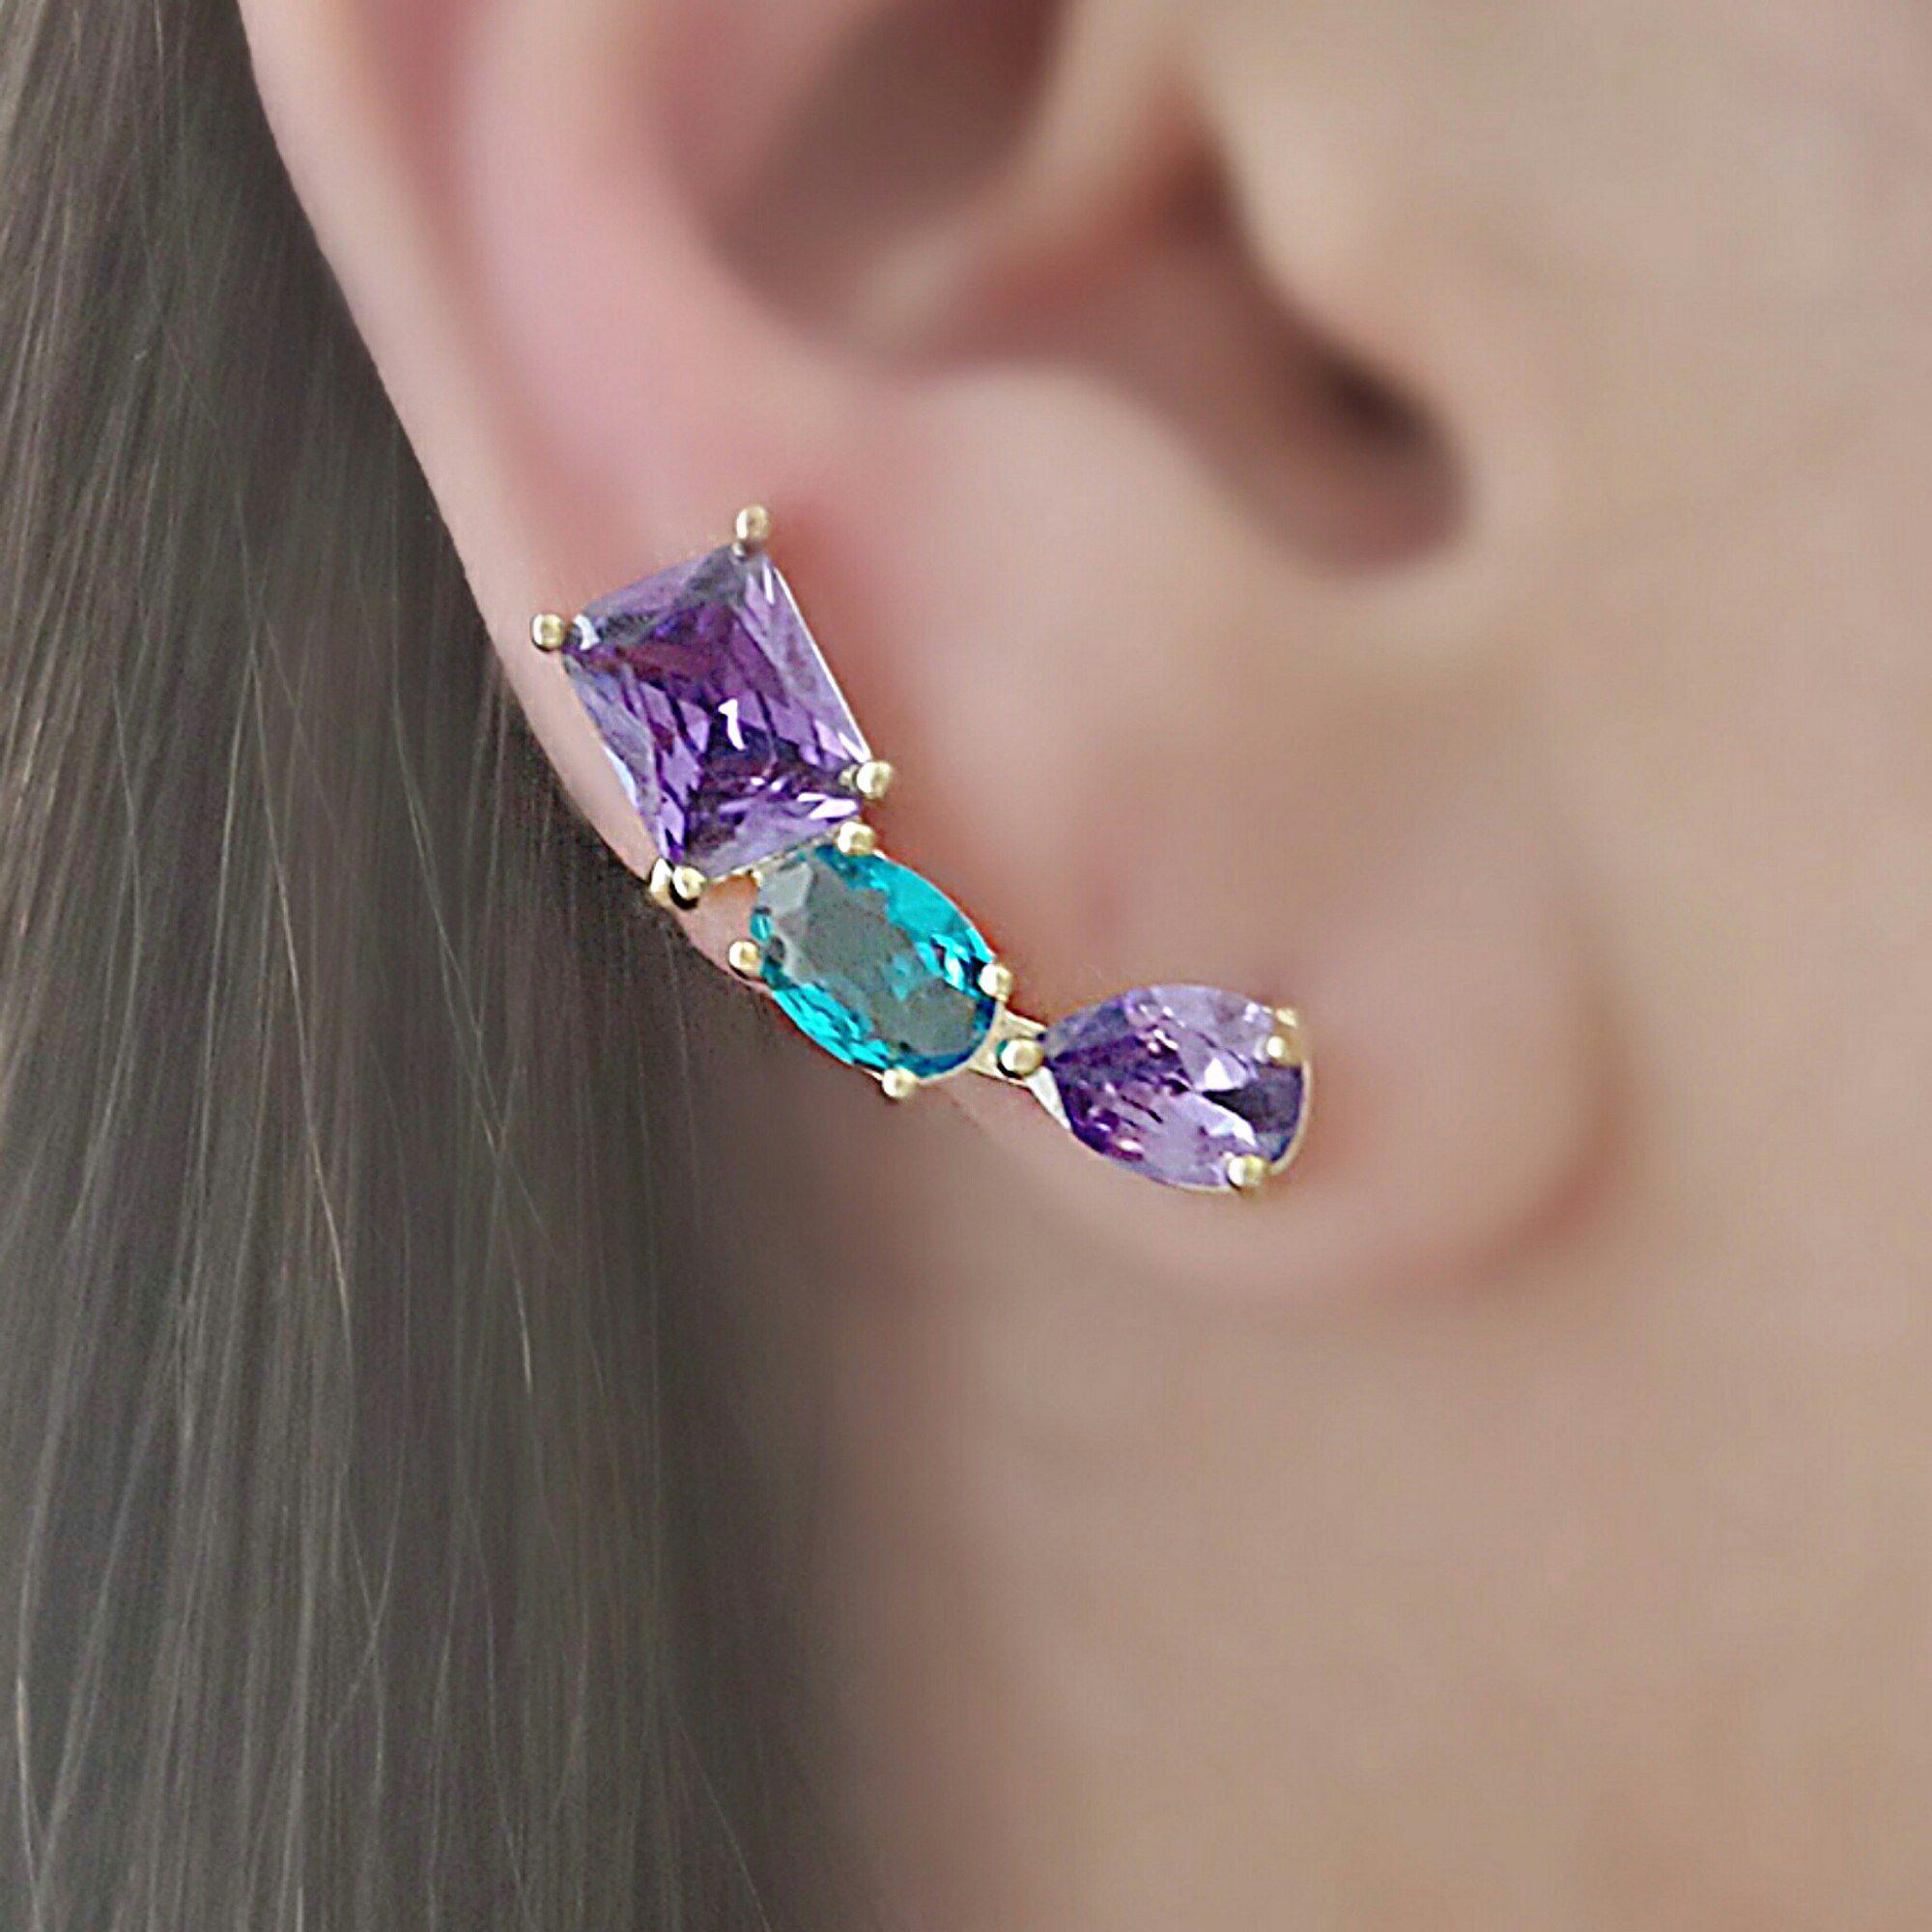 Ear Cuff Moda Colorido com Garra Semijoia Folheada Ouro  - Soloyou